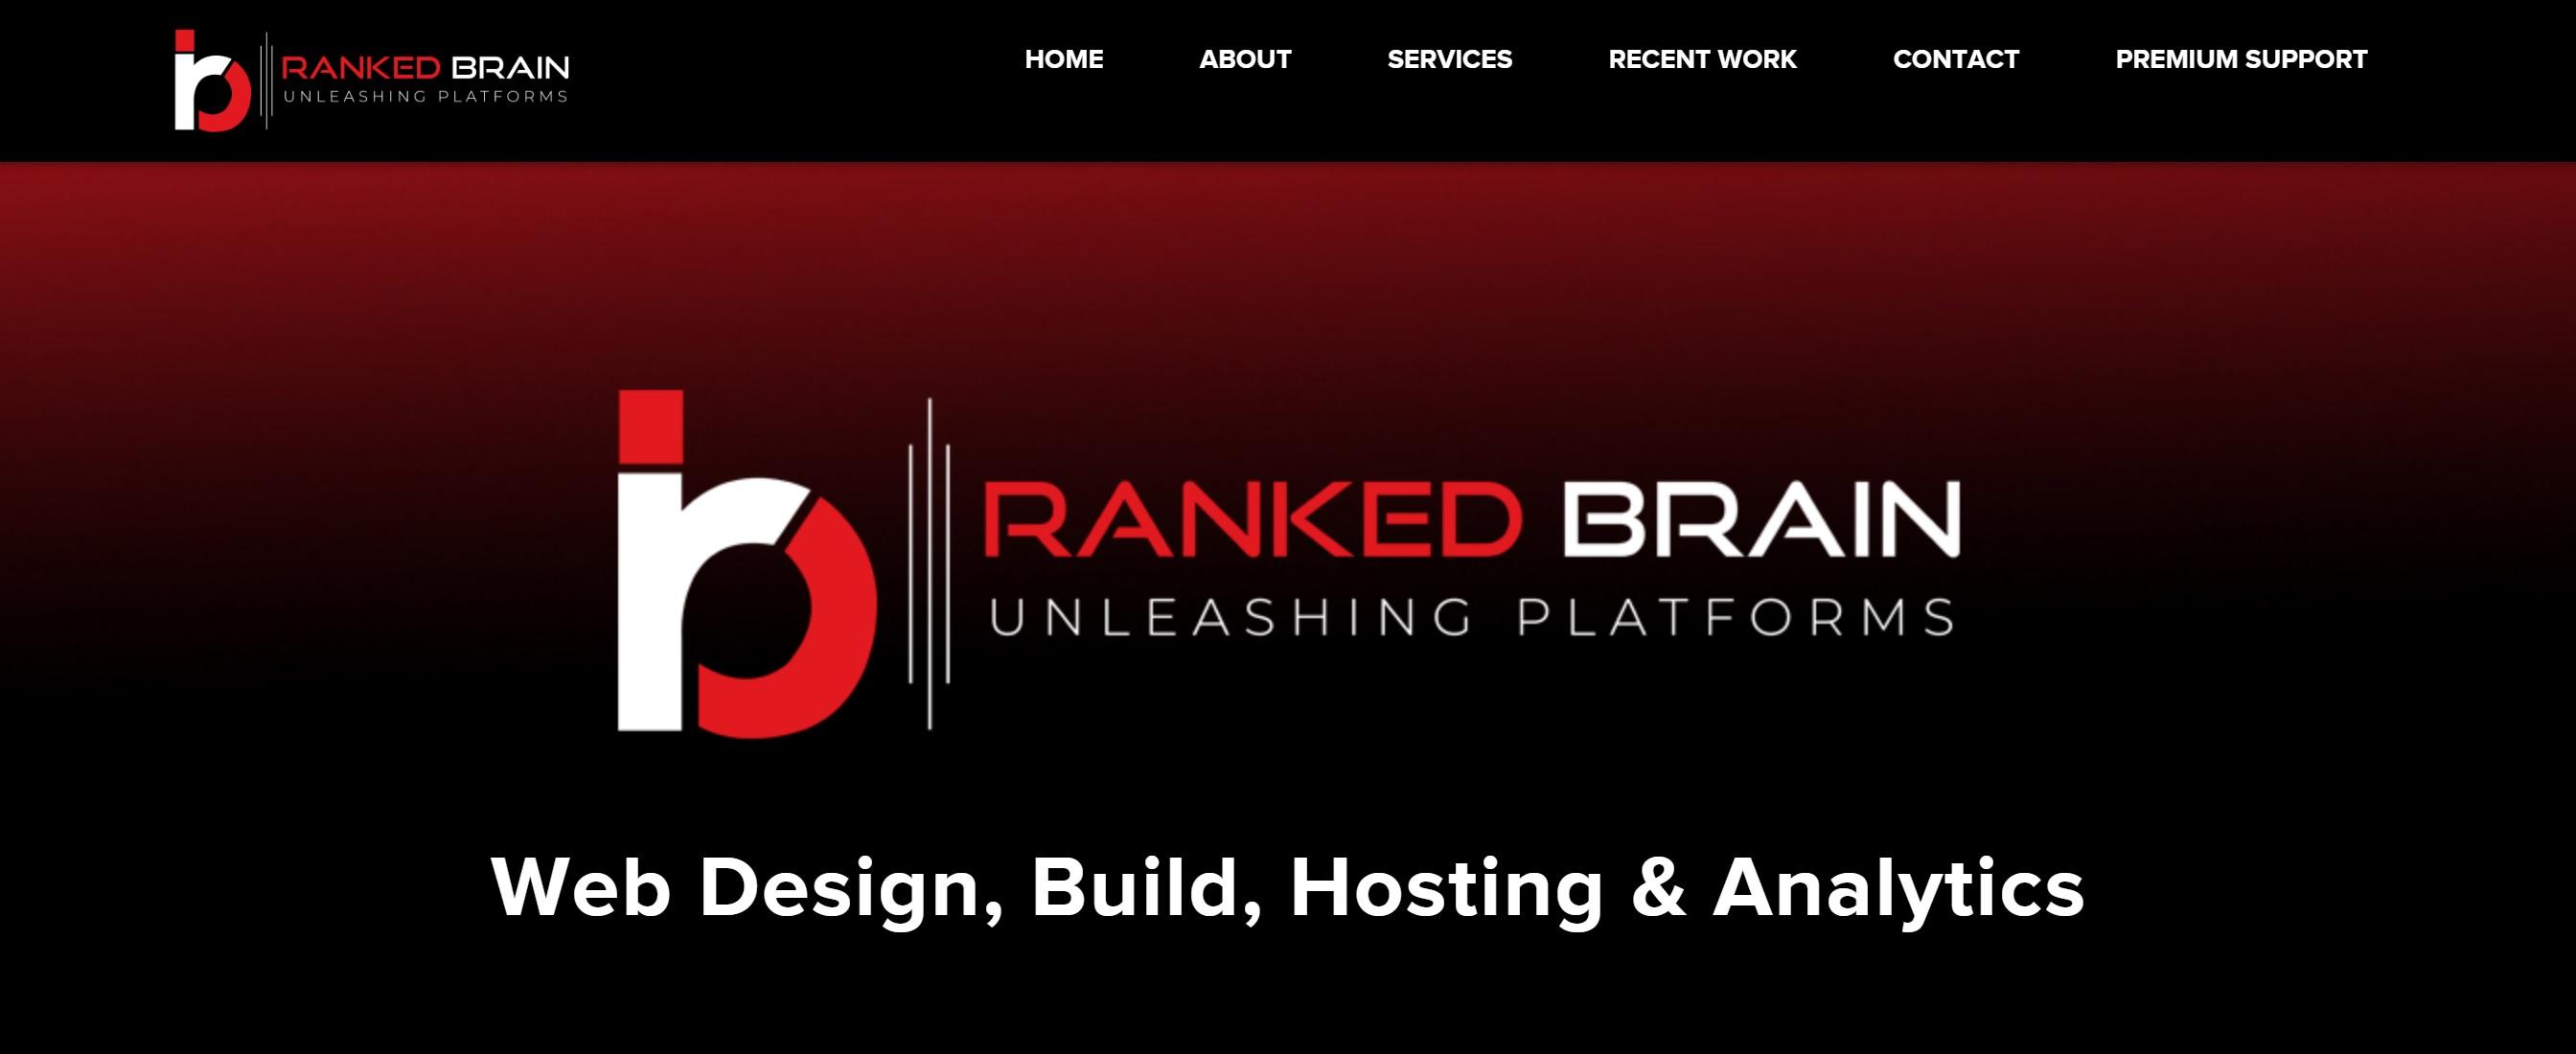 Ranked Brain reviews | Web Design at 14949 W 124th Terrace - Olathe KS